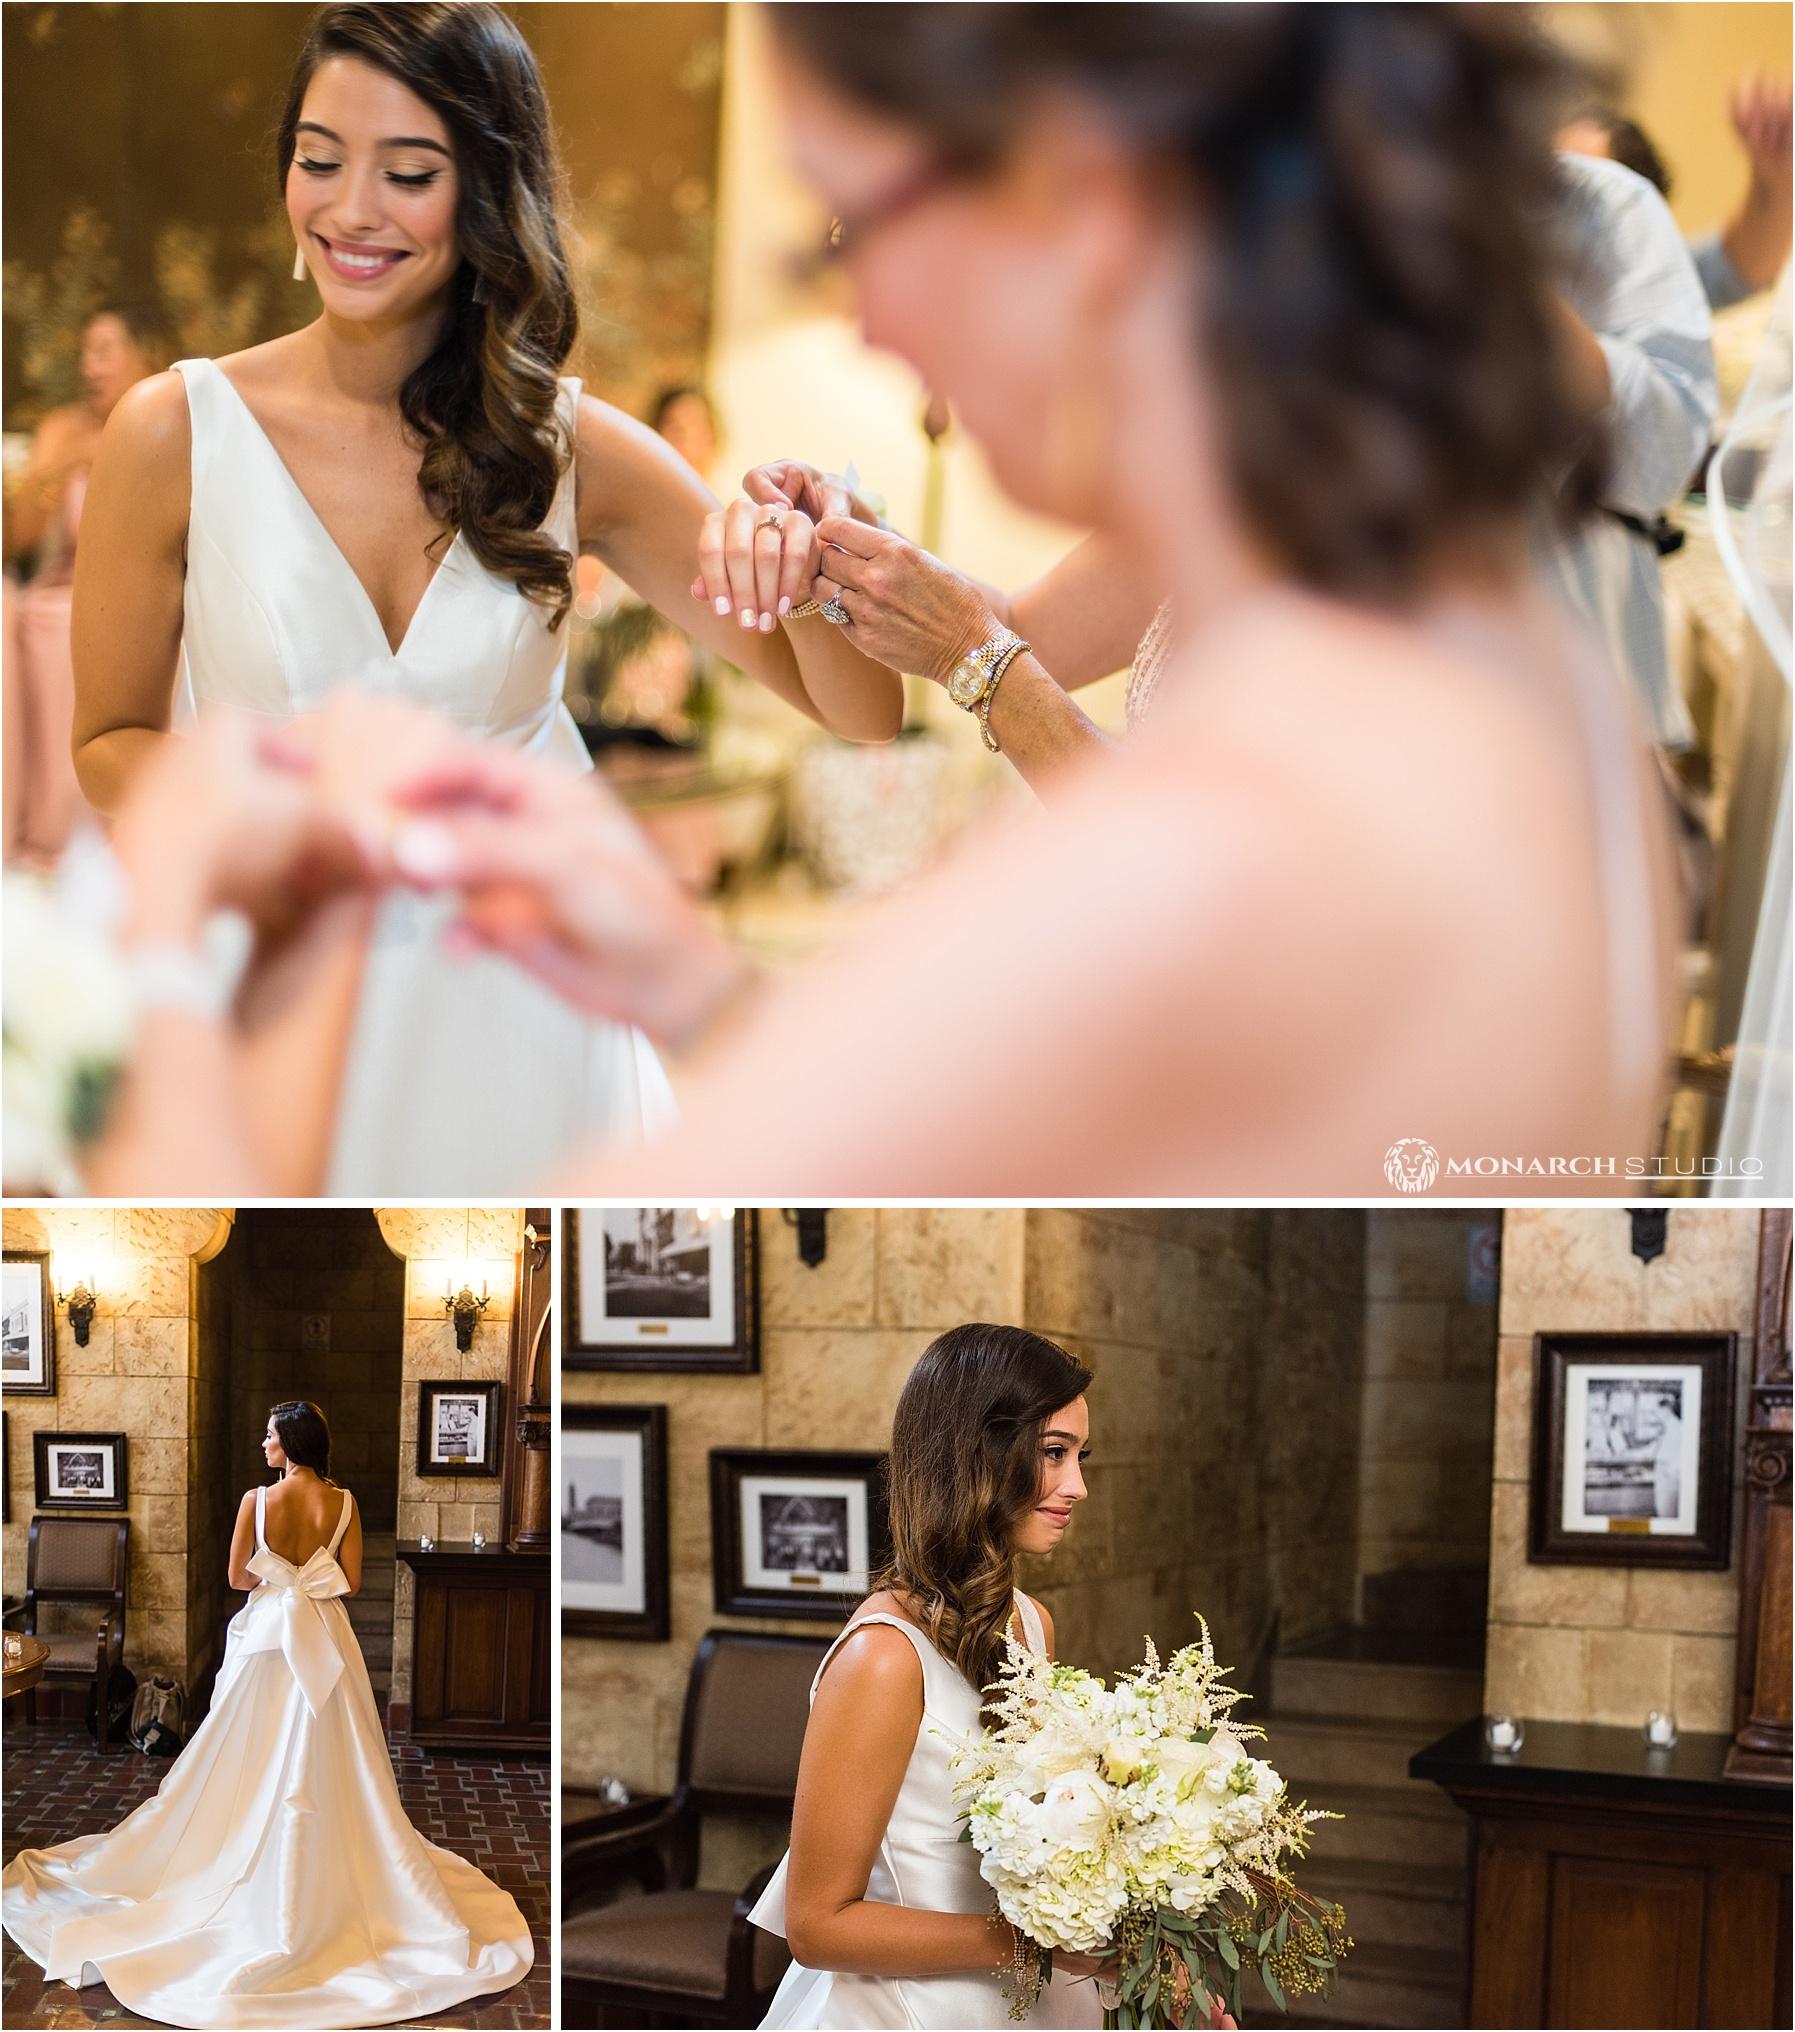 st-augustine-wedding-photographer-023.jpg